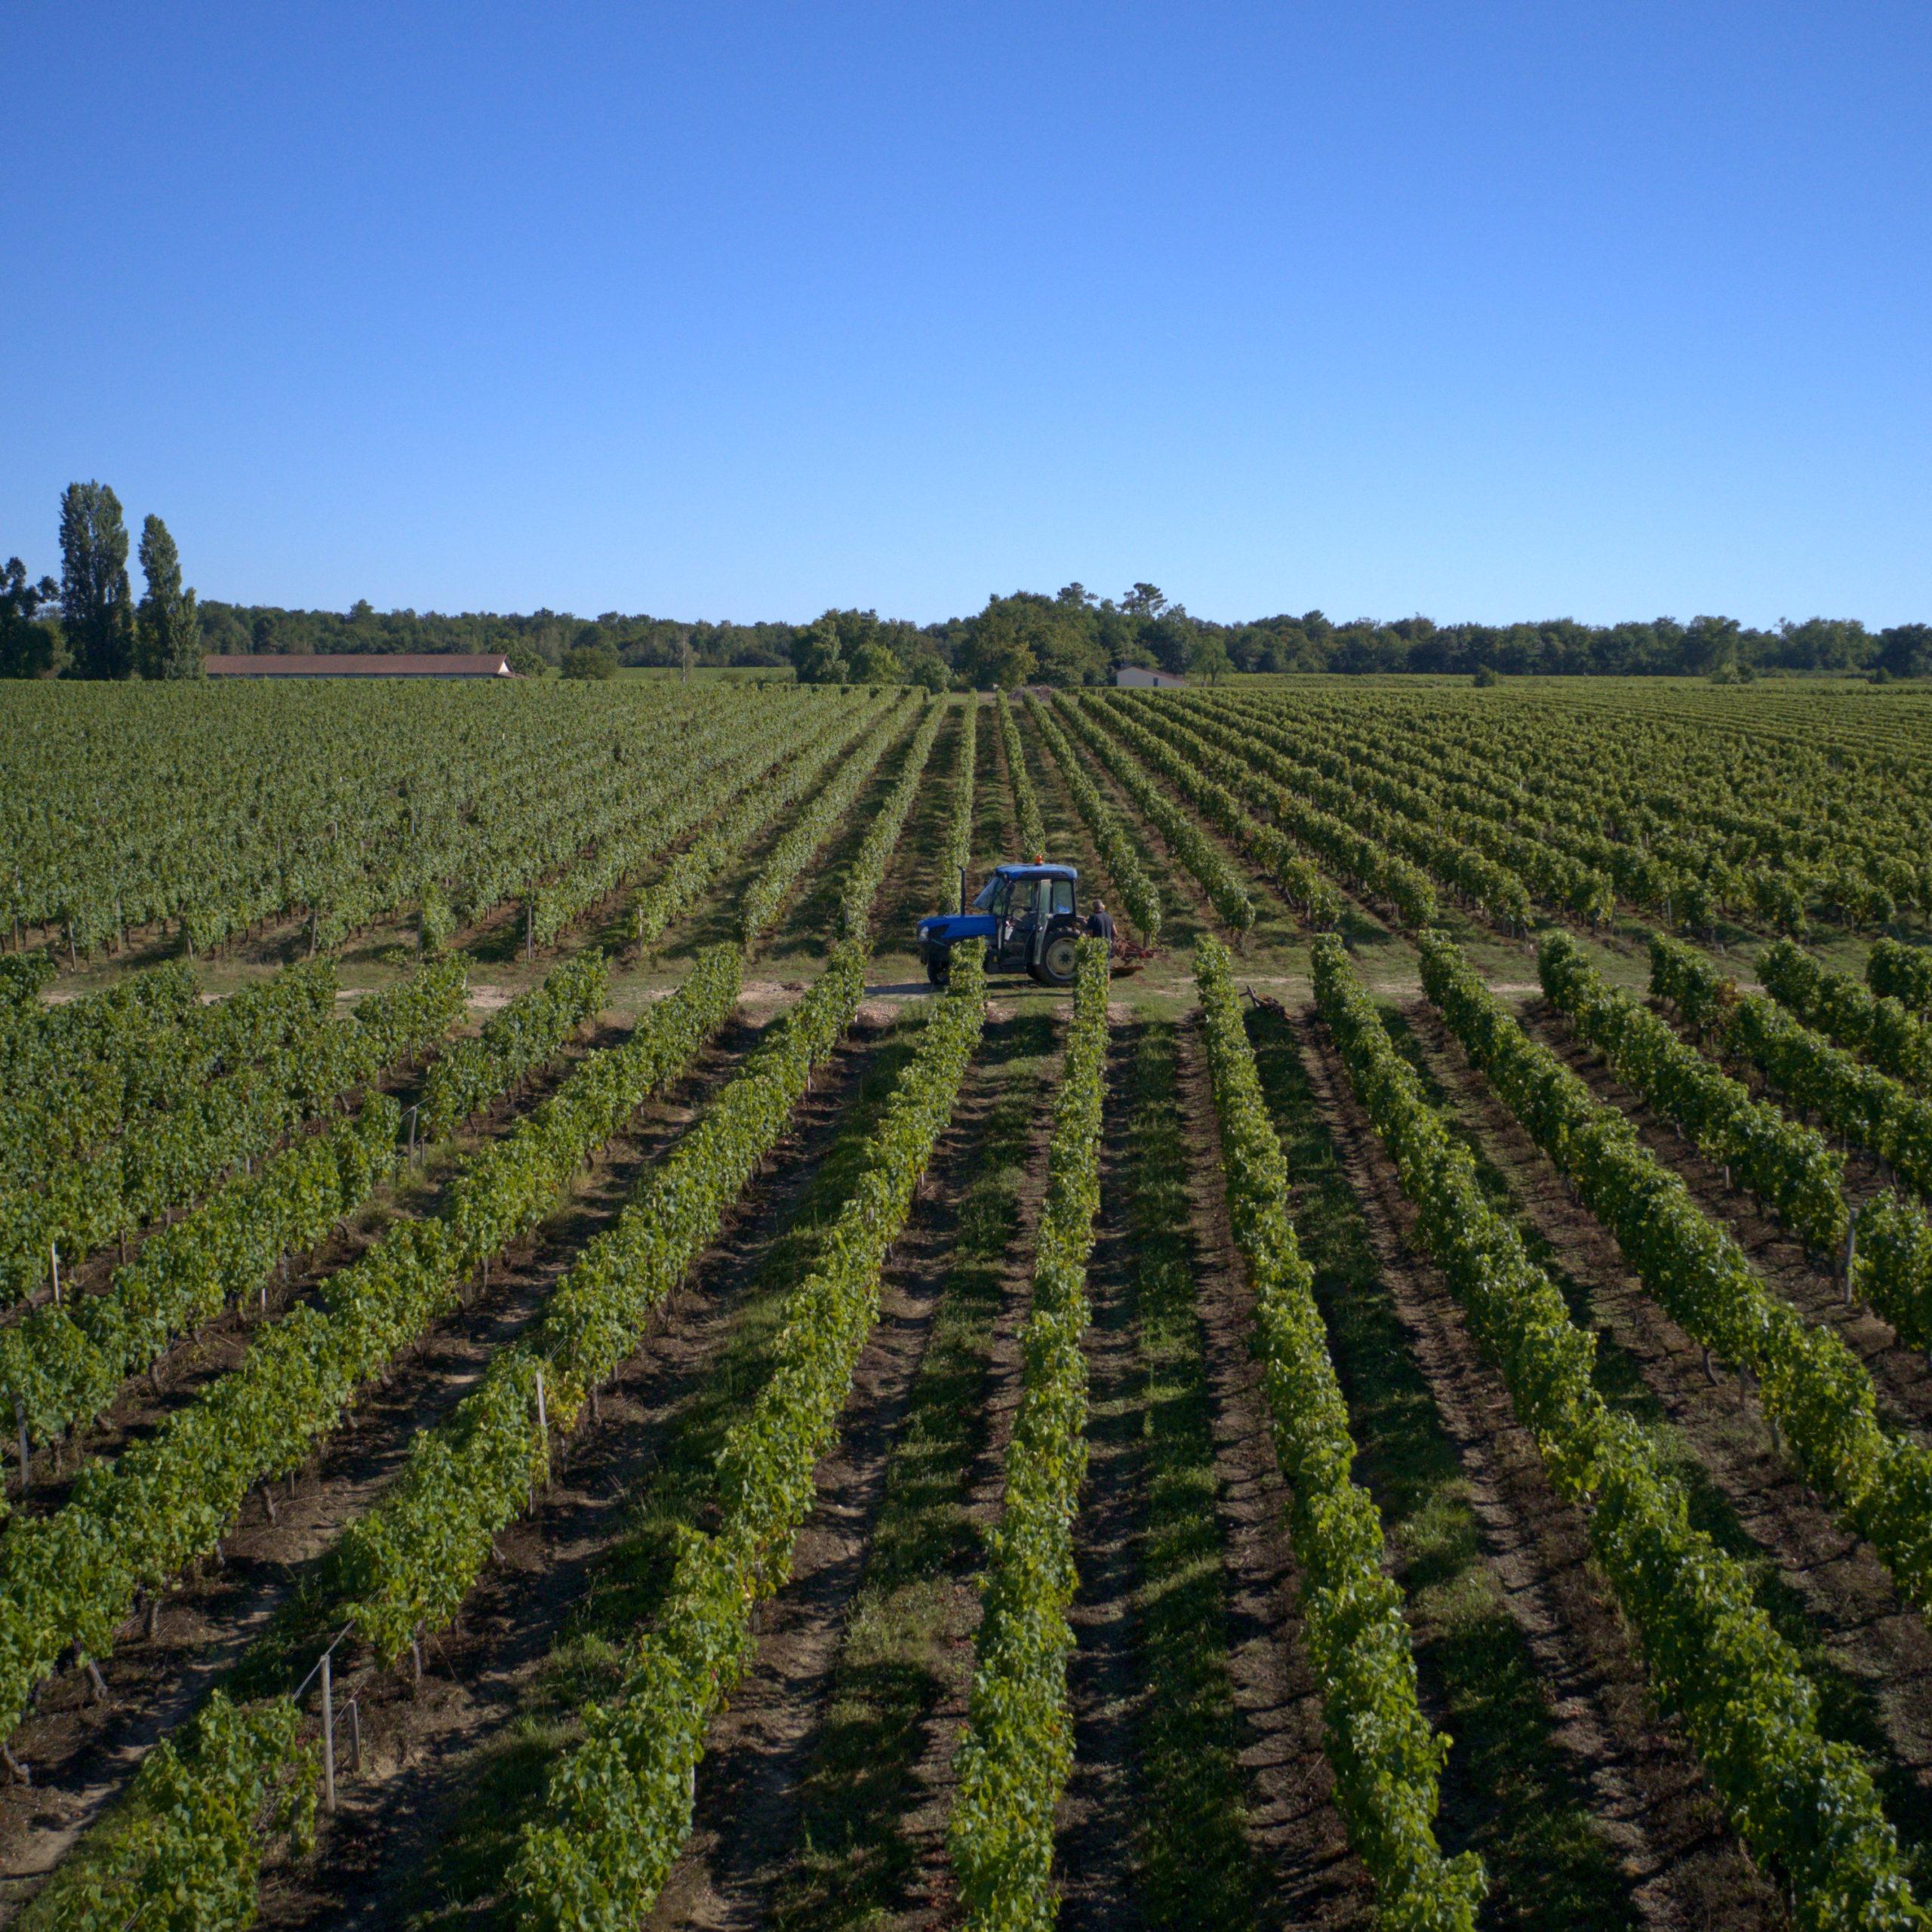 paysage rang de vignes avec tracteur et ciel bleu